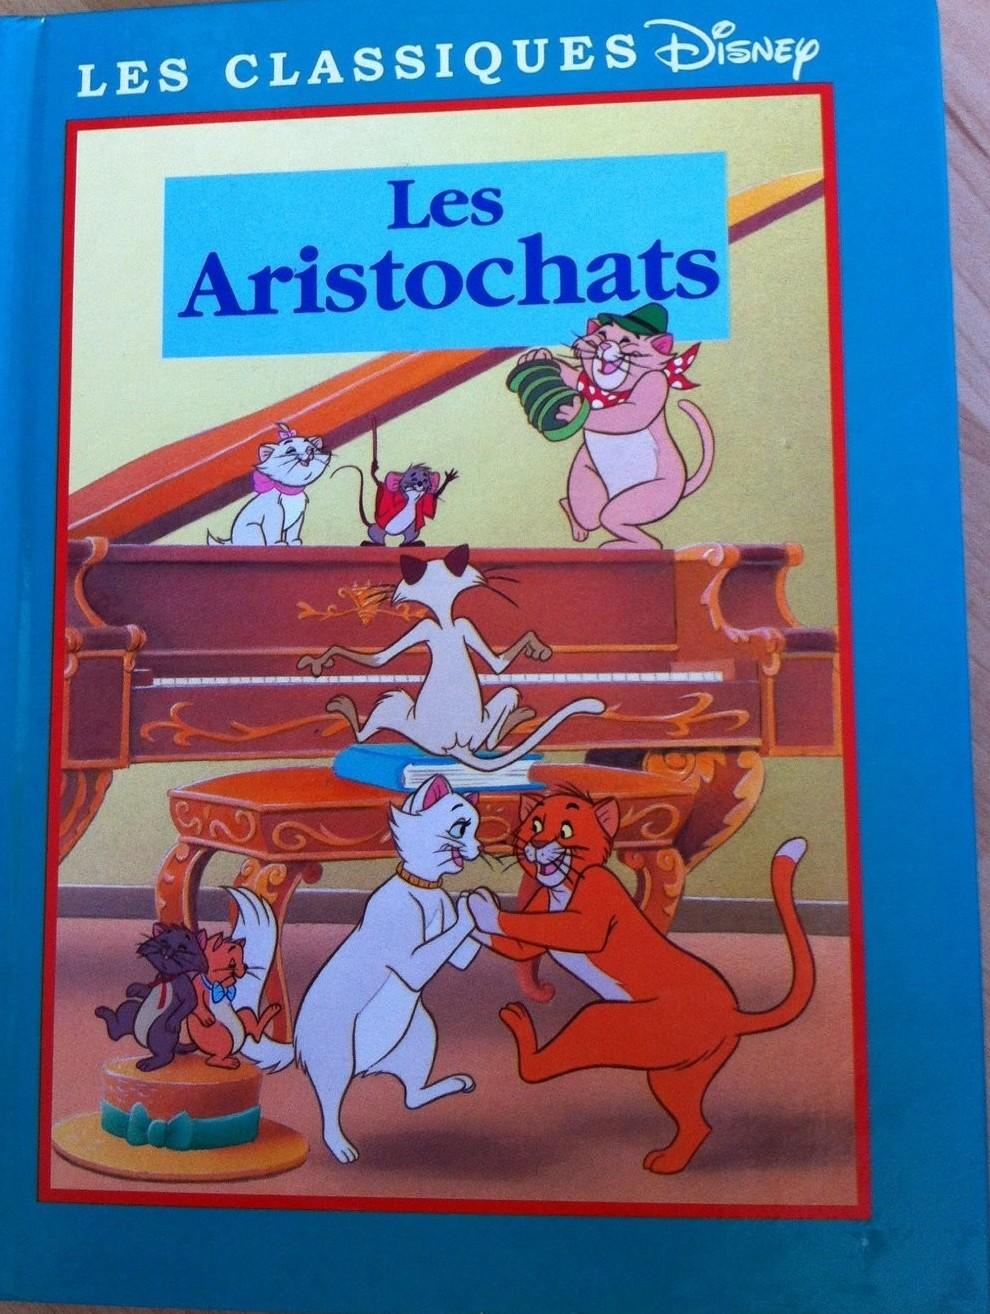 Les Aristochats Livre Les Classiques Disney Edition